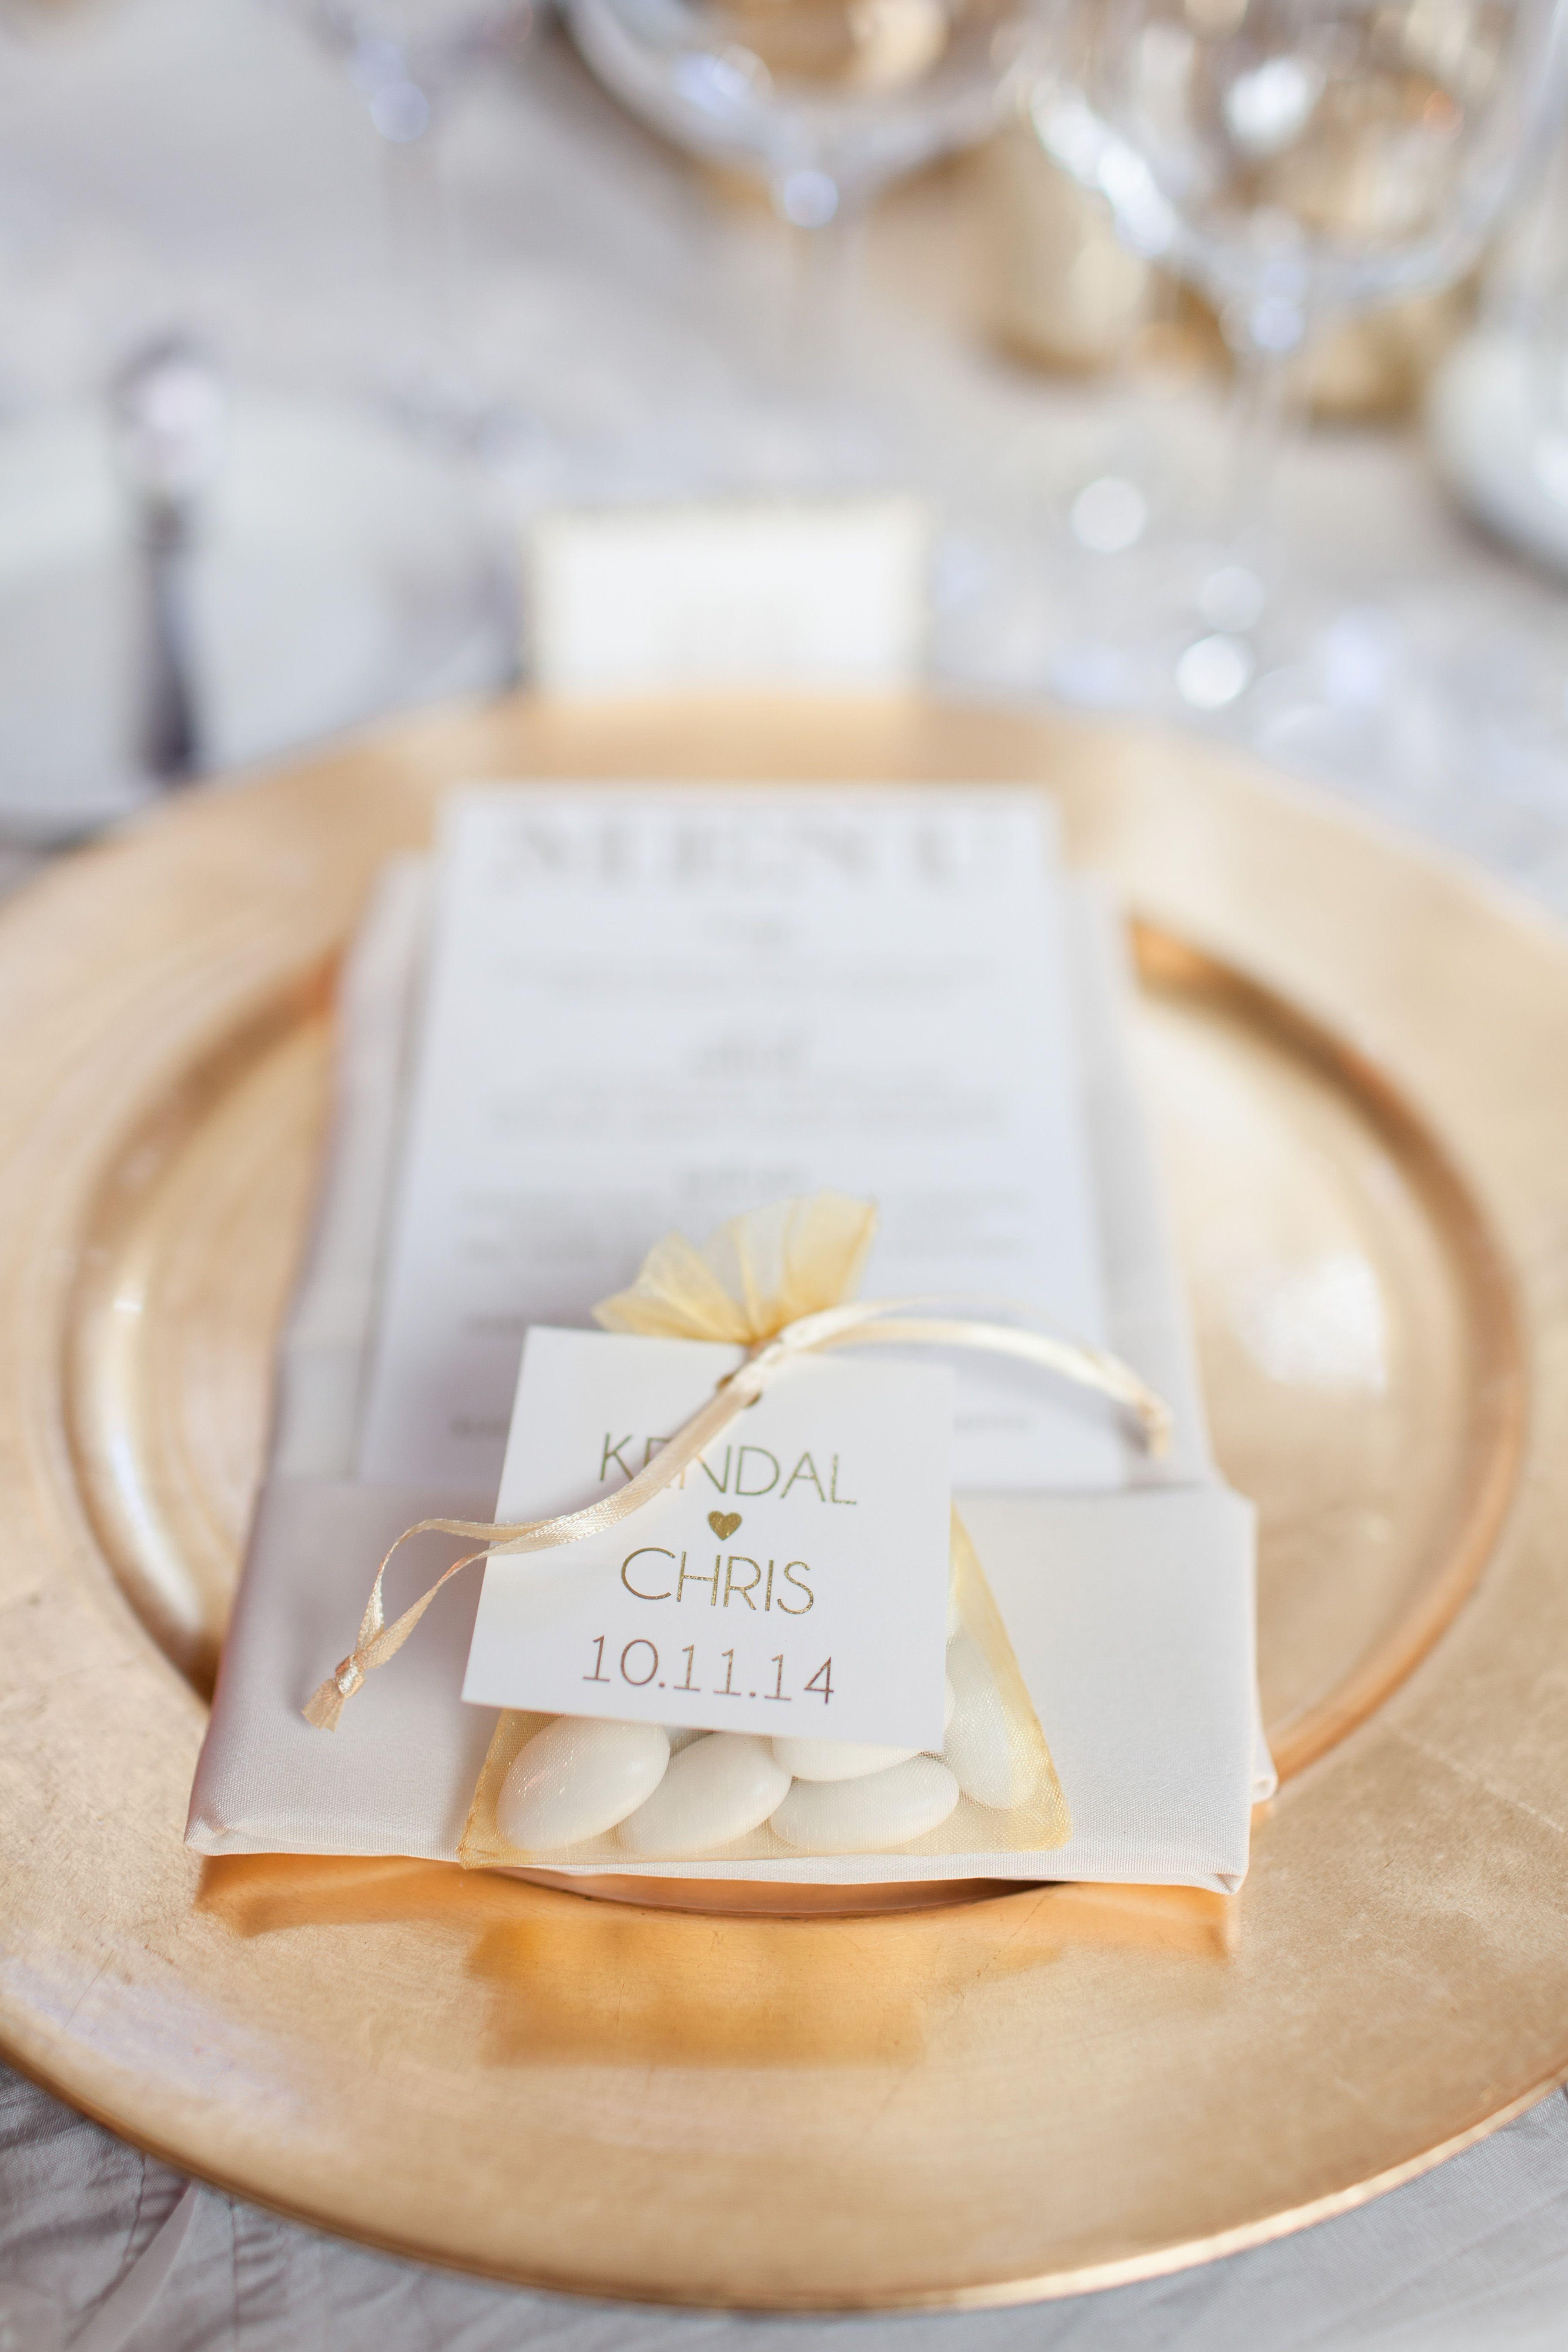 Jordan Almond Wedding Favors | Wedding | Pinterest | Almond wedding ...